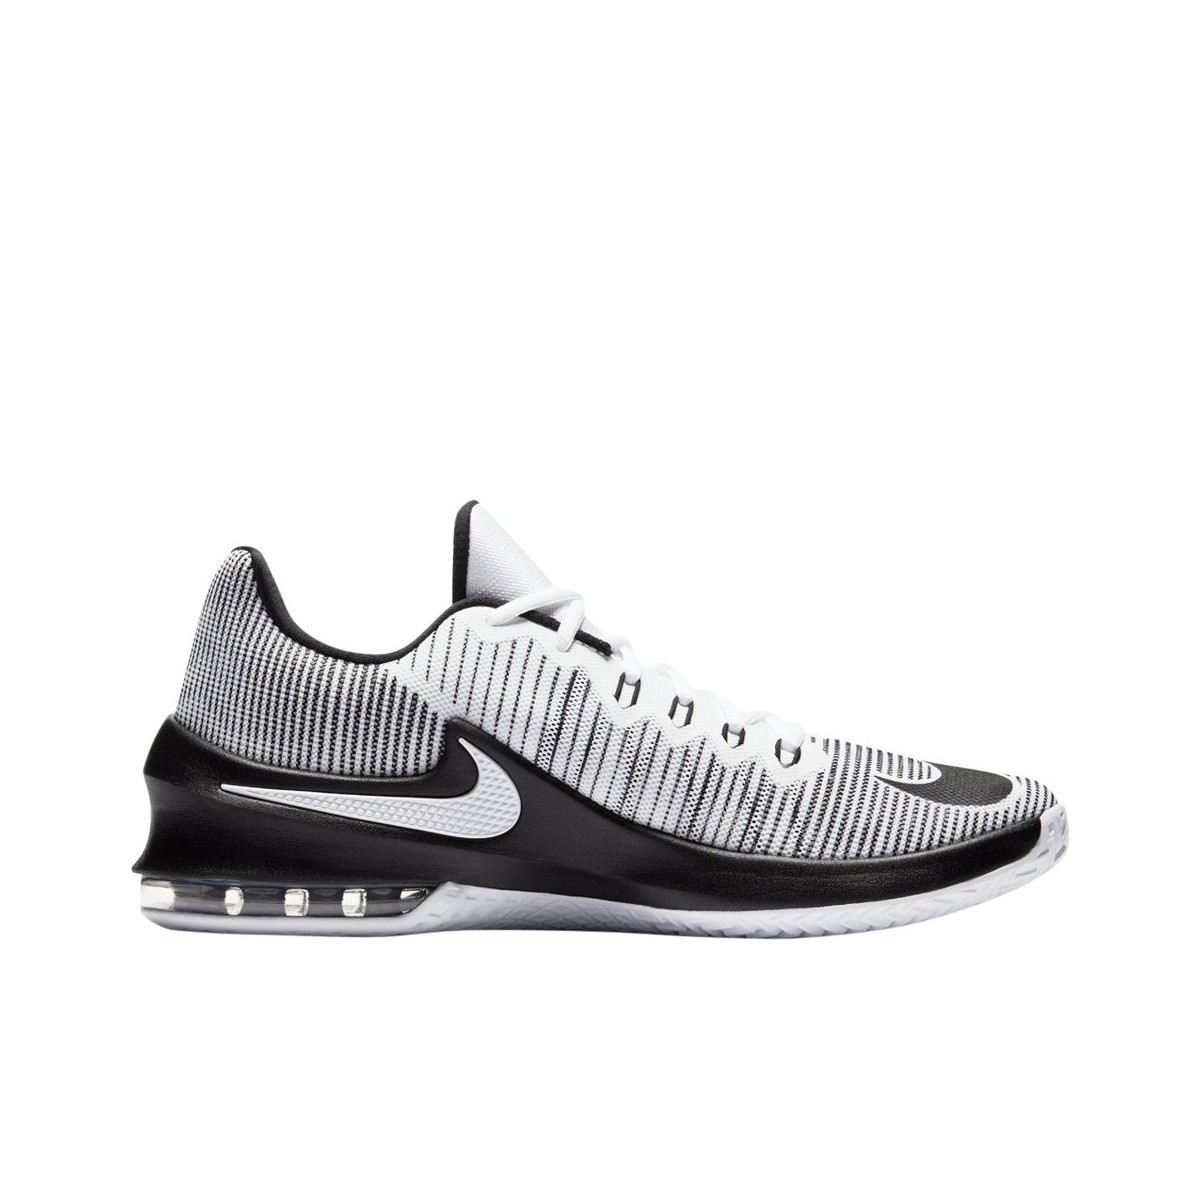 on sale 78b47 091f1 Nike Air Max Infuriate 2 Low Zapatilla Hombre 908975 100 Blancas